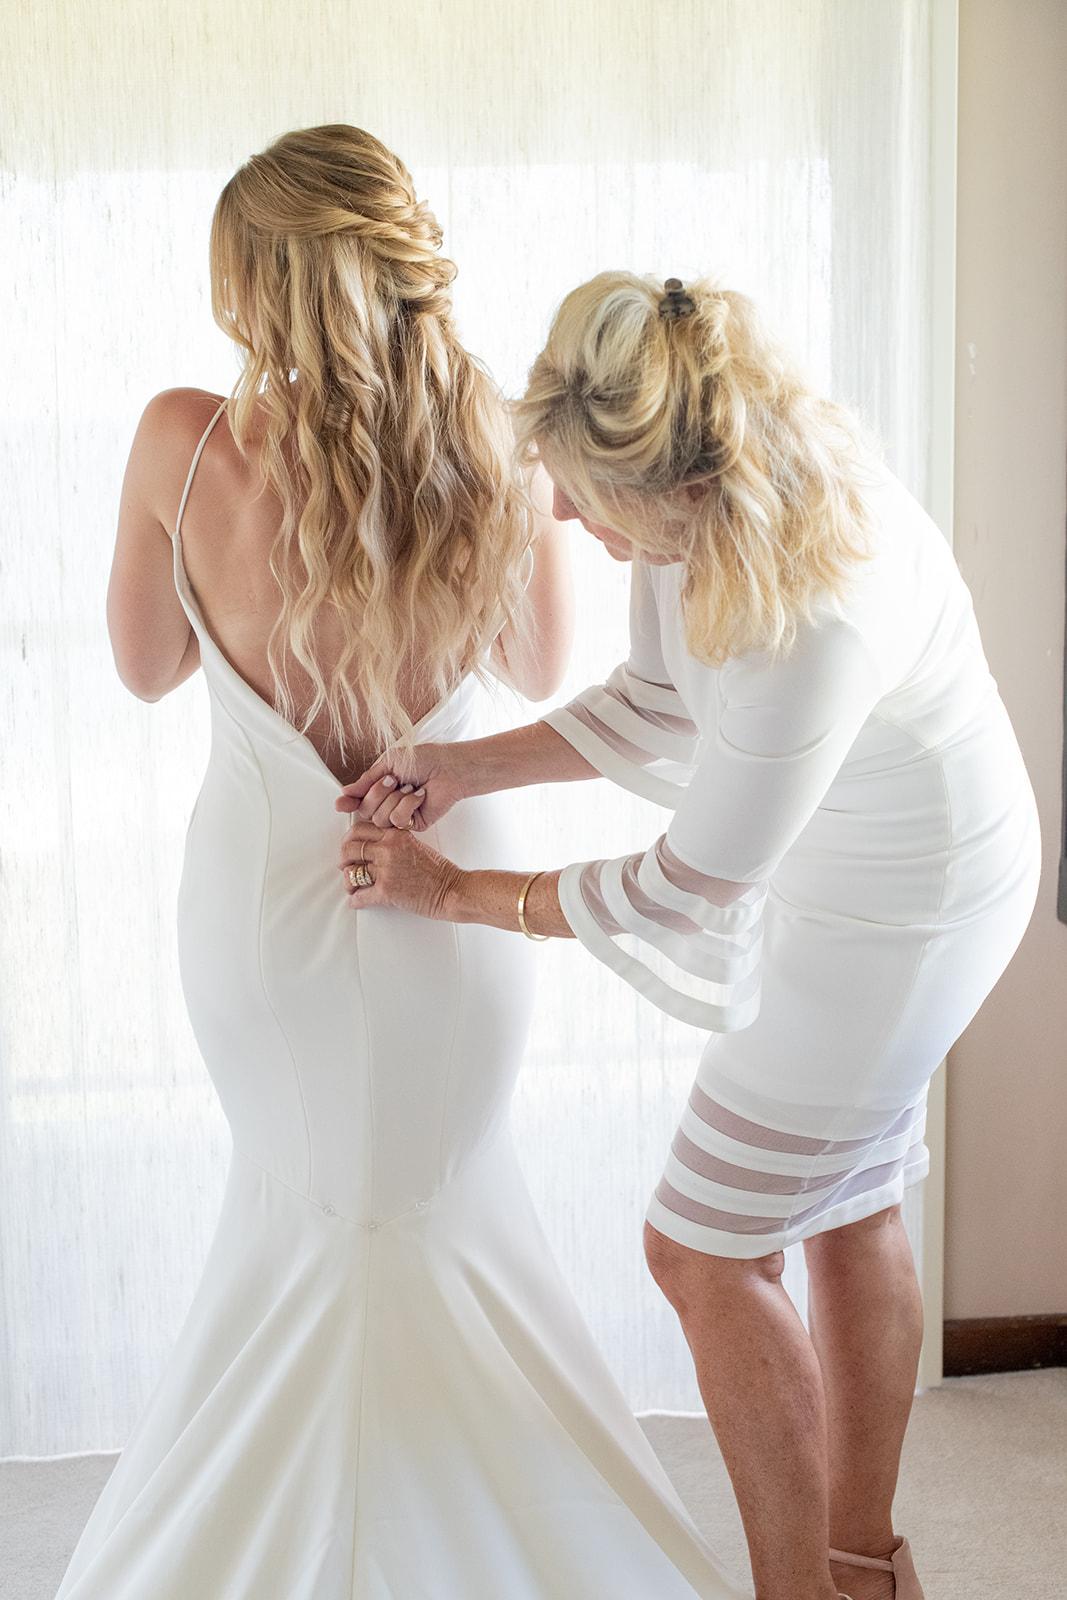 mom zipping up wedding dress spokane bride